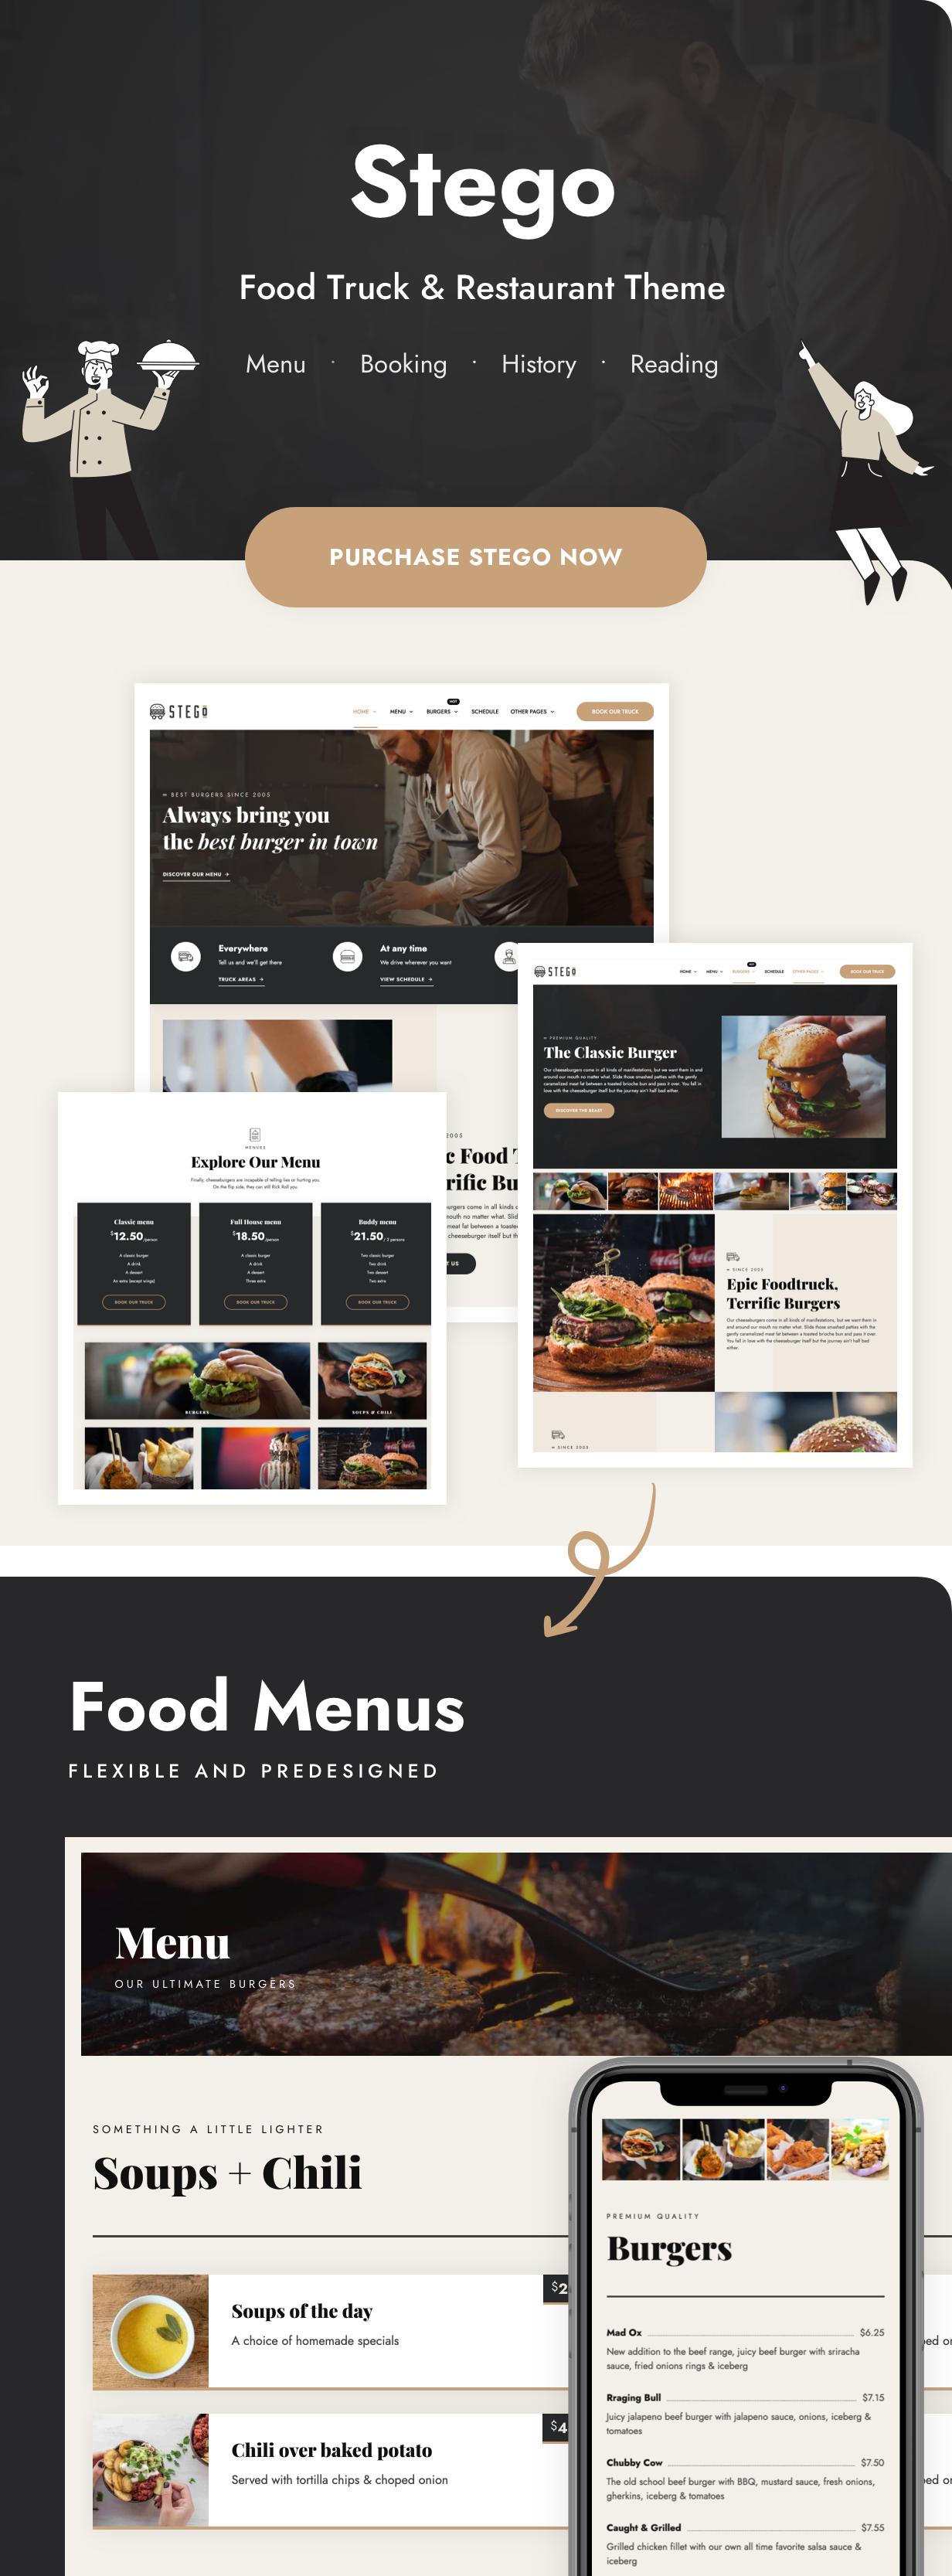 Stego - Food Truck & Restaurant Theme - 4